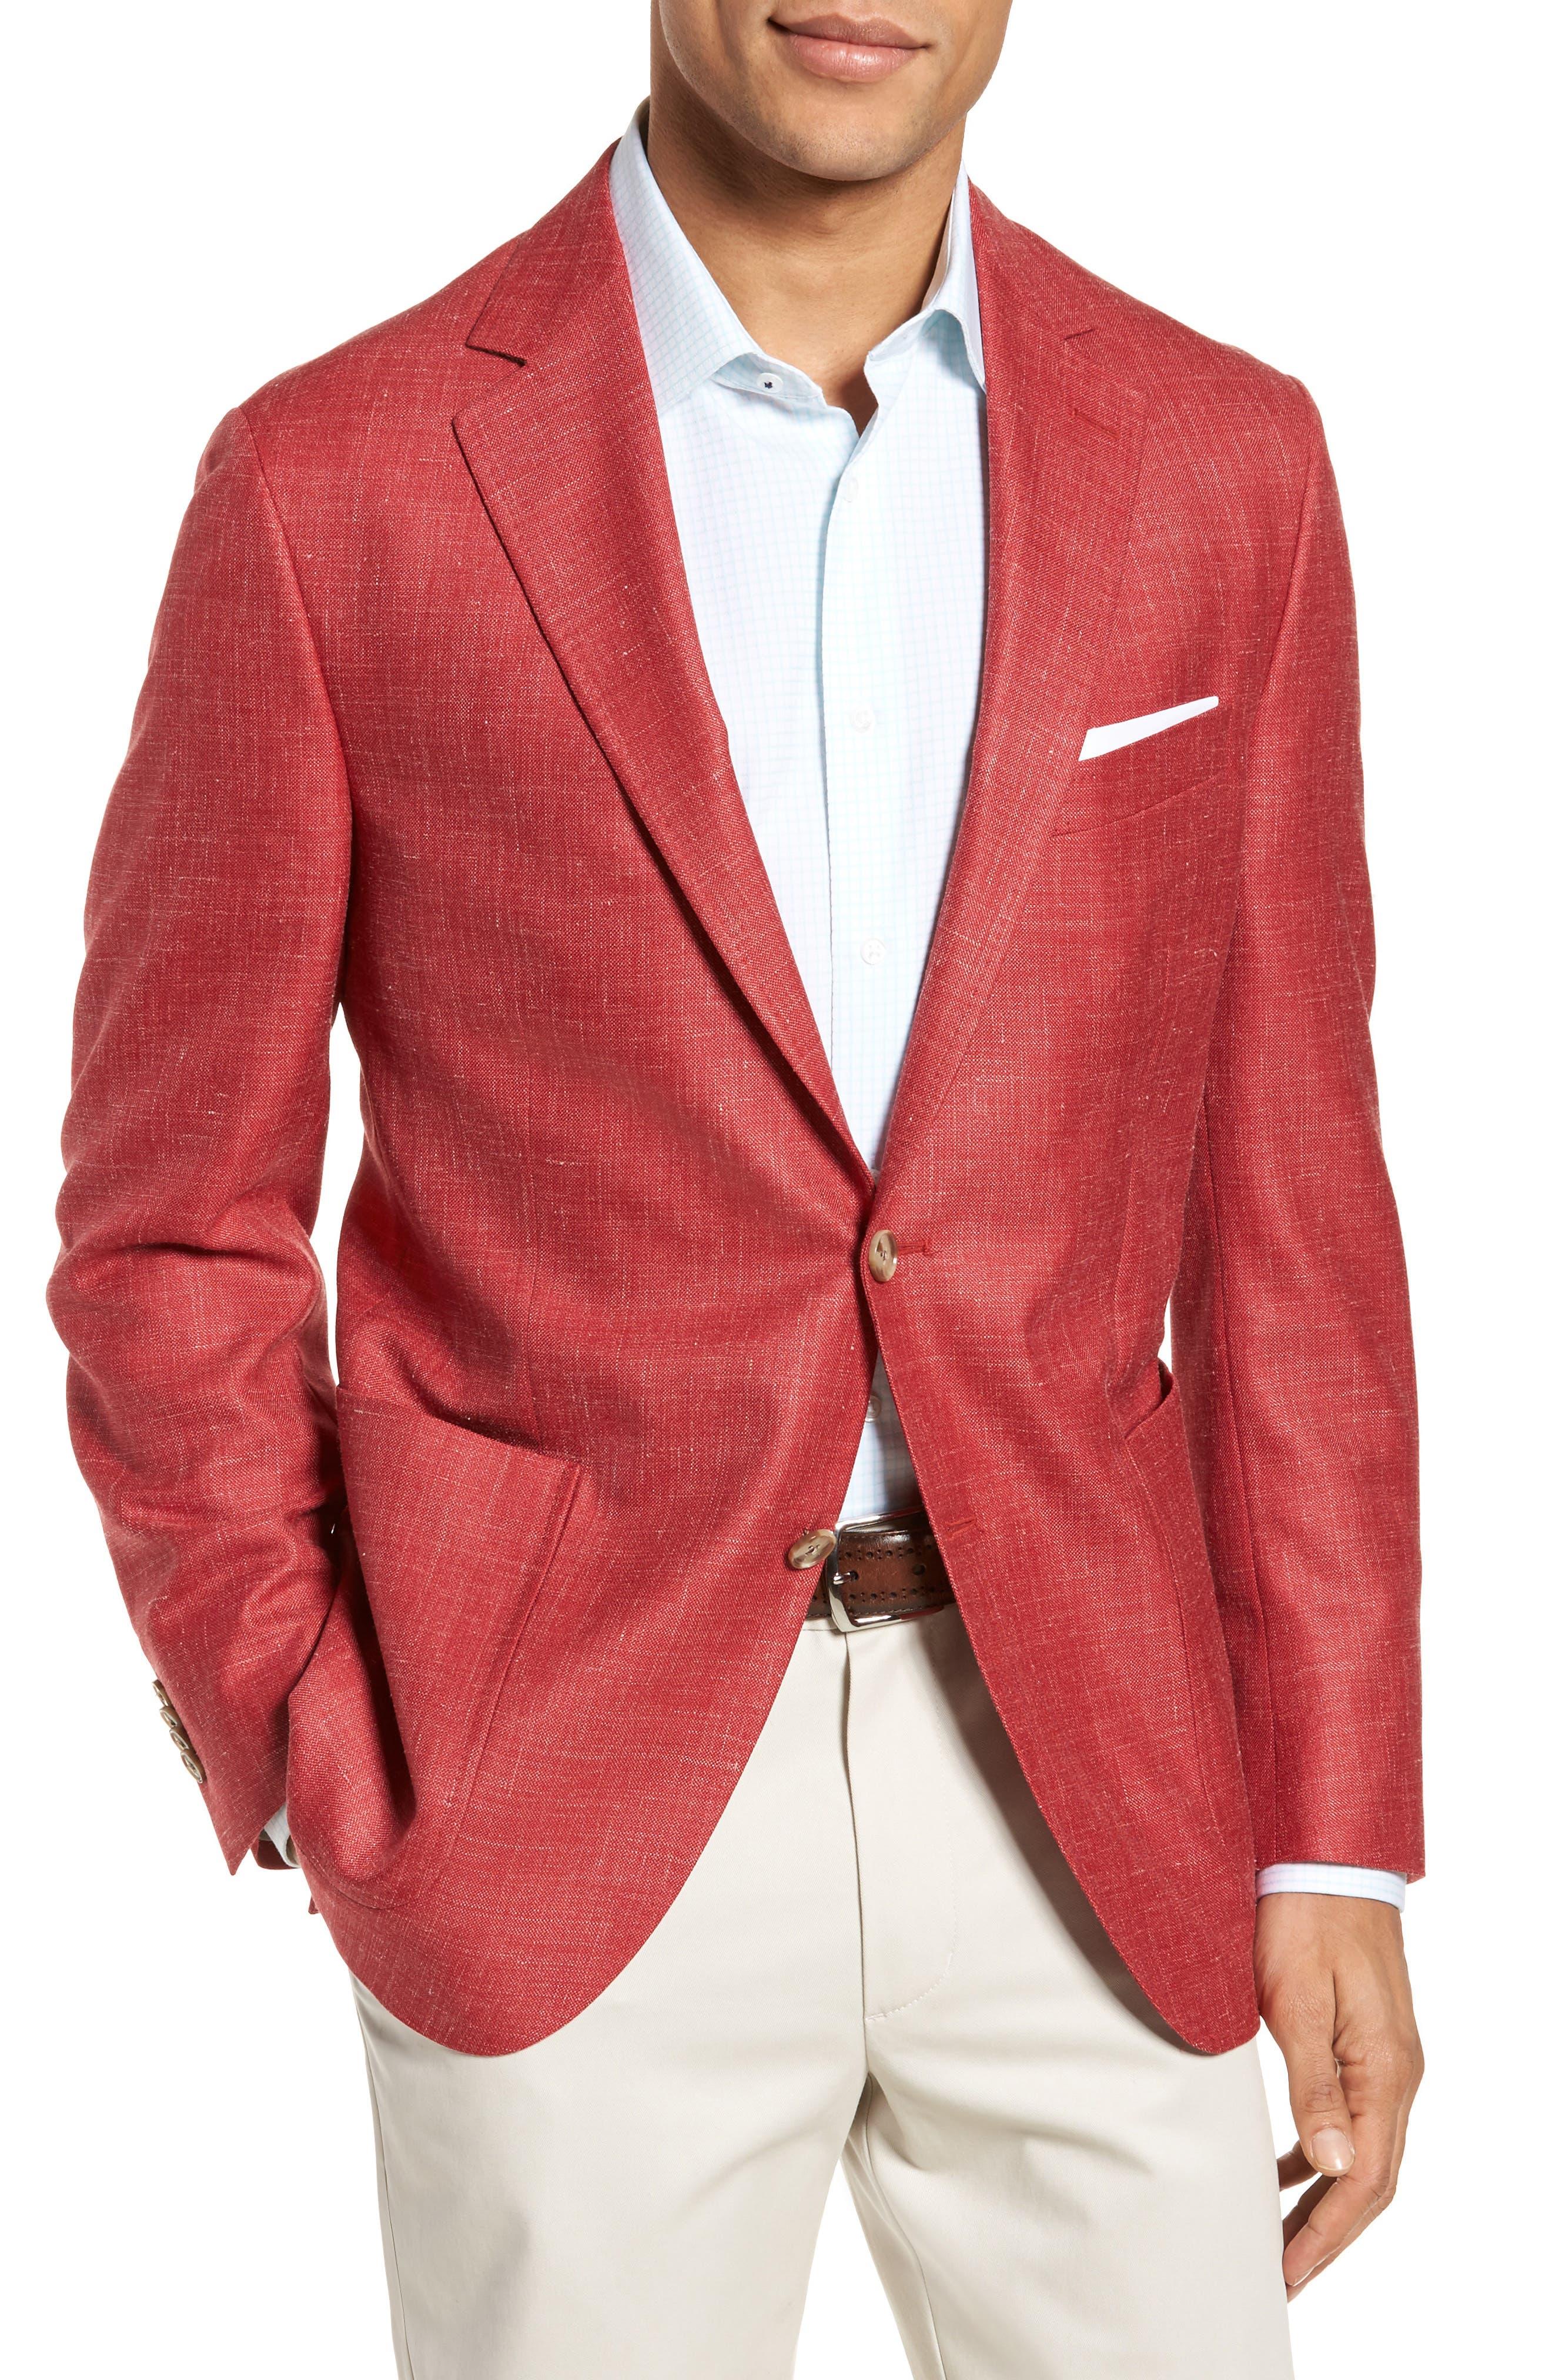 Alternate Image 1 Selected - Peter Millar Classic Fit Wool Blend Blazer